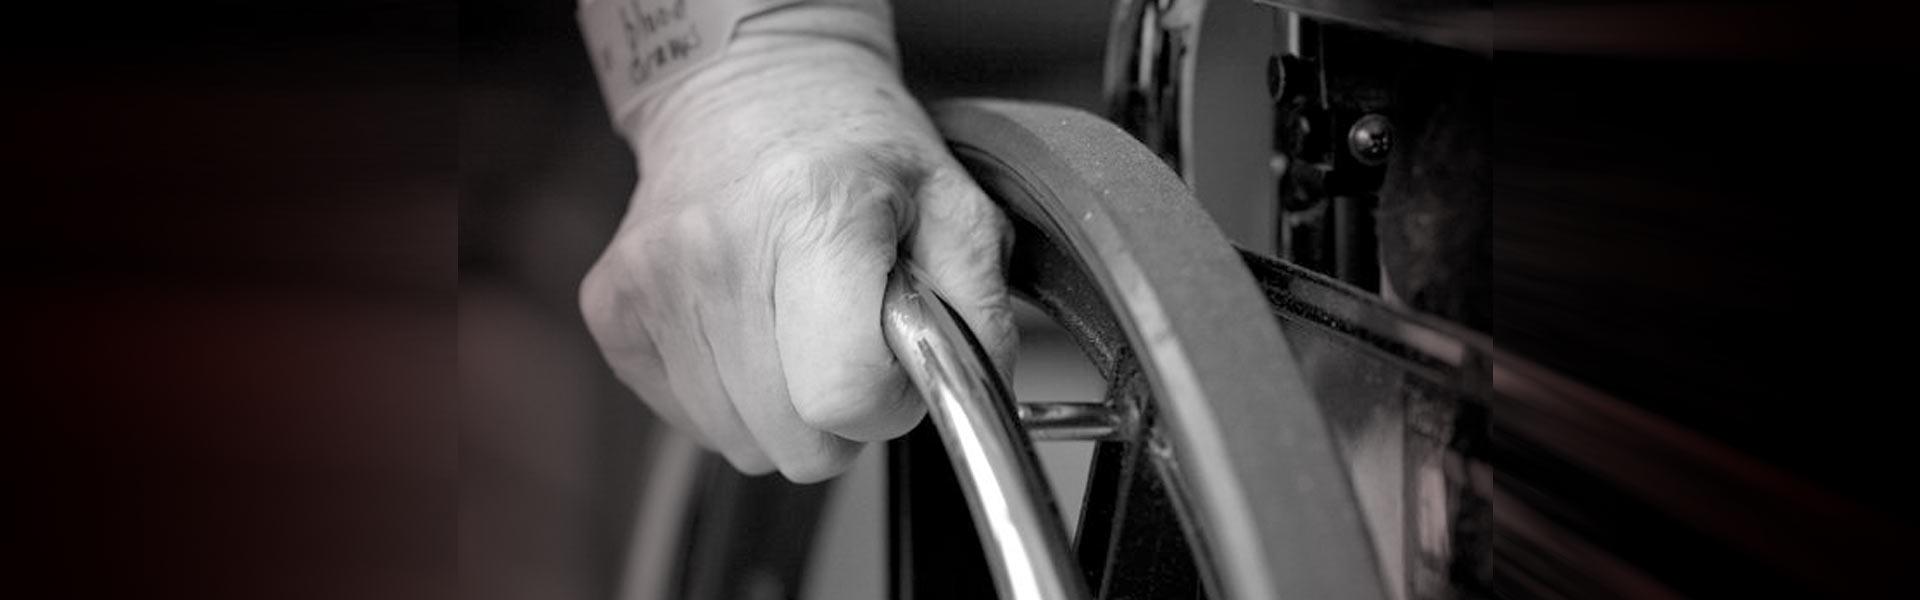 Millhbrook Healthcare story image